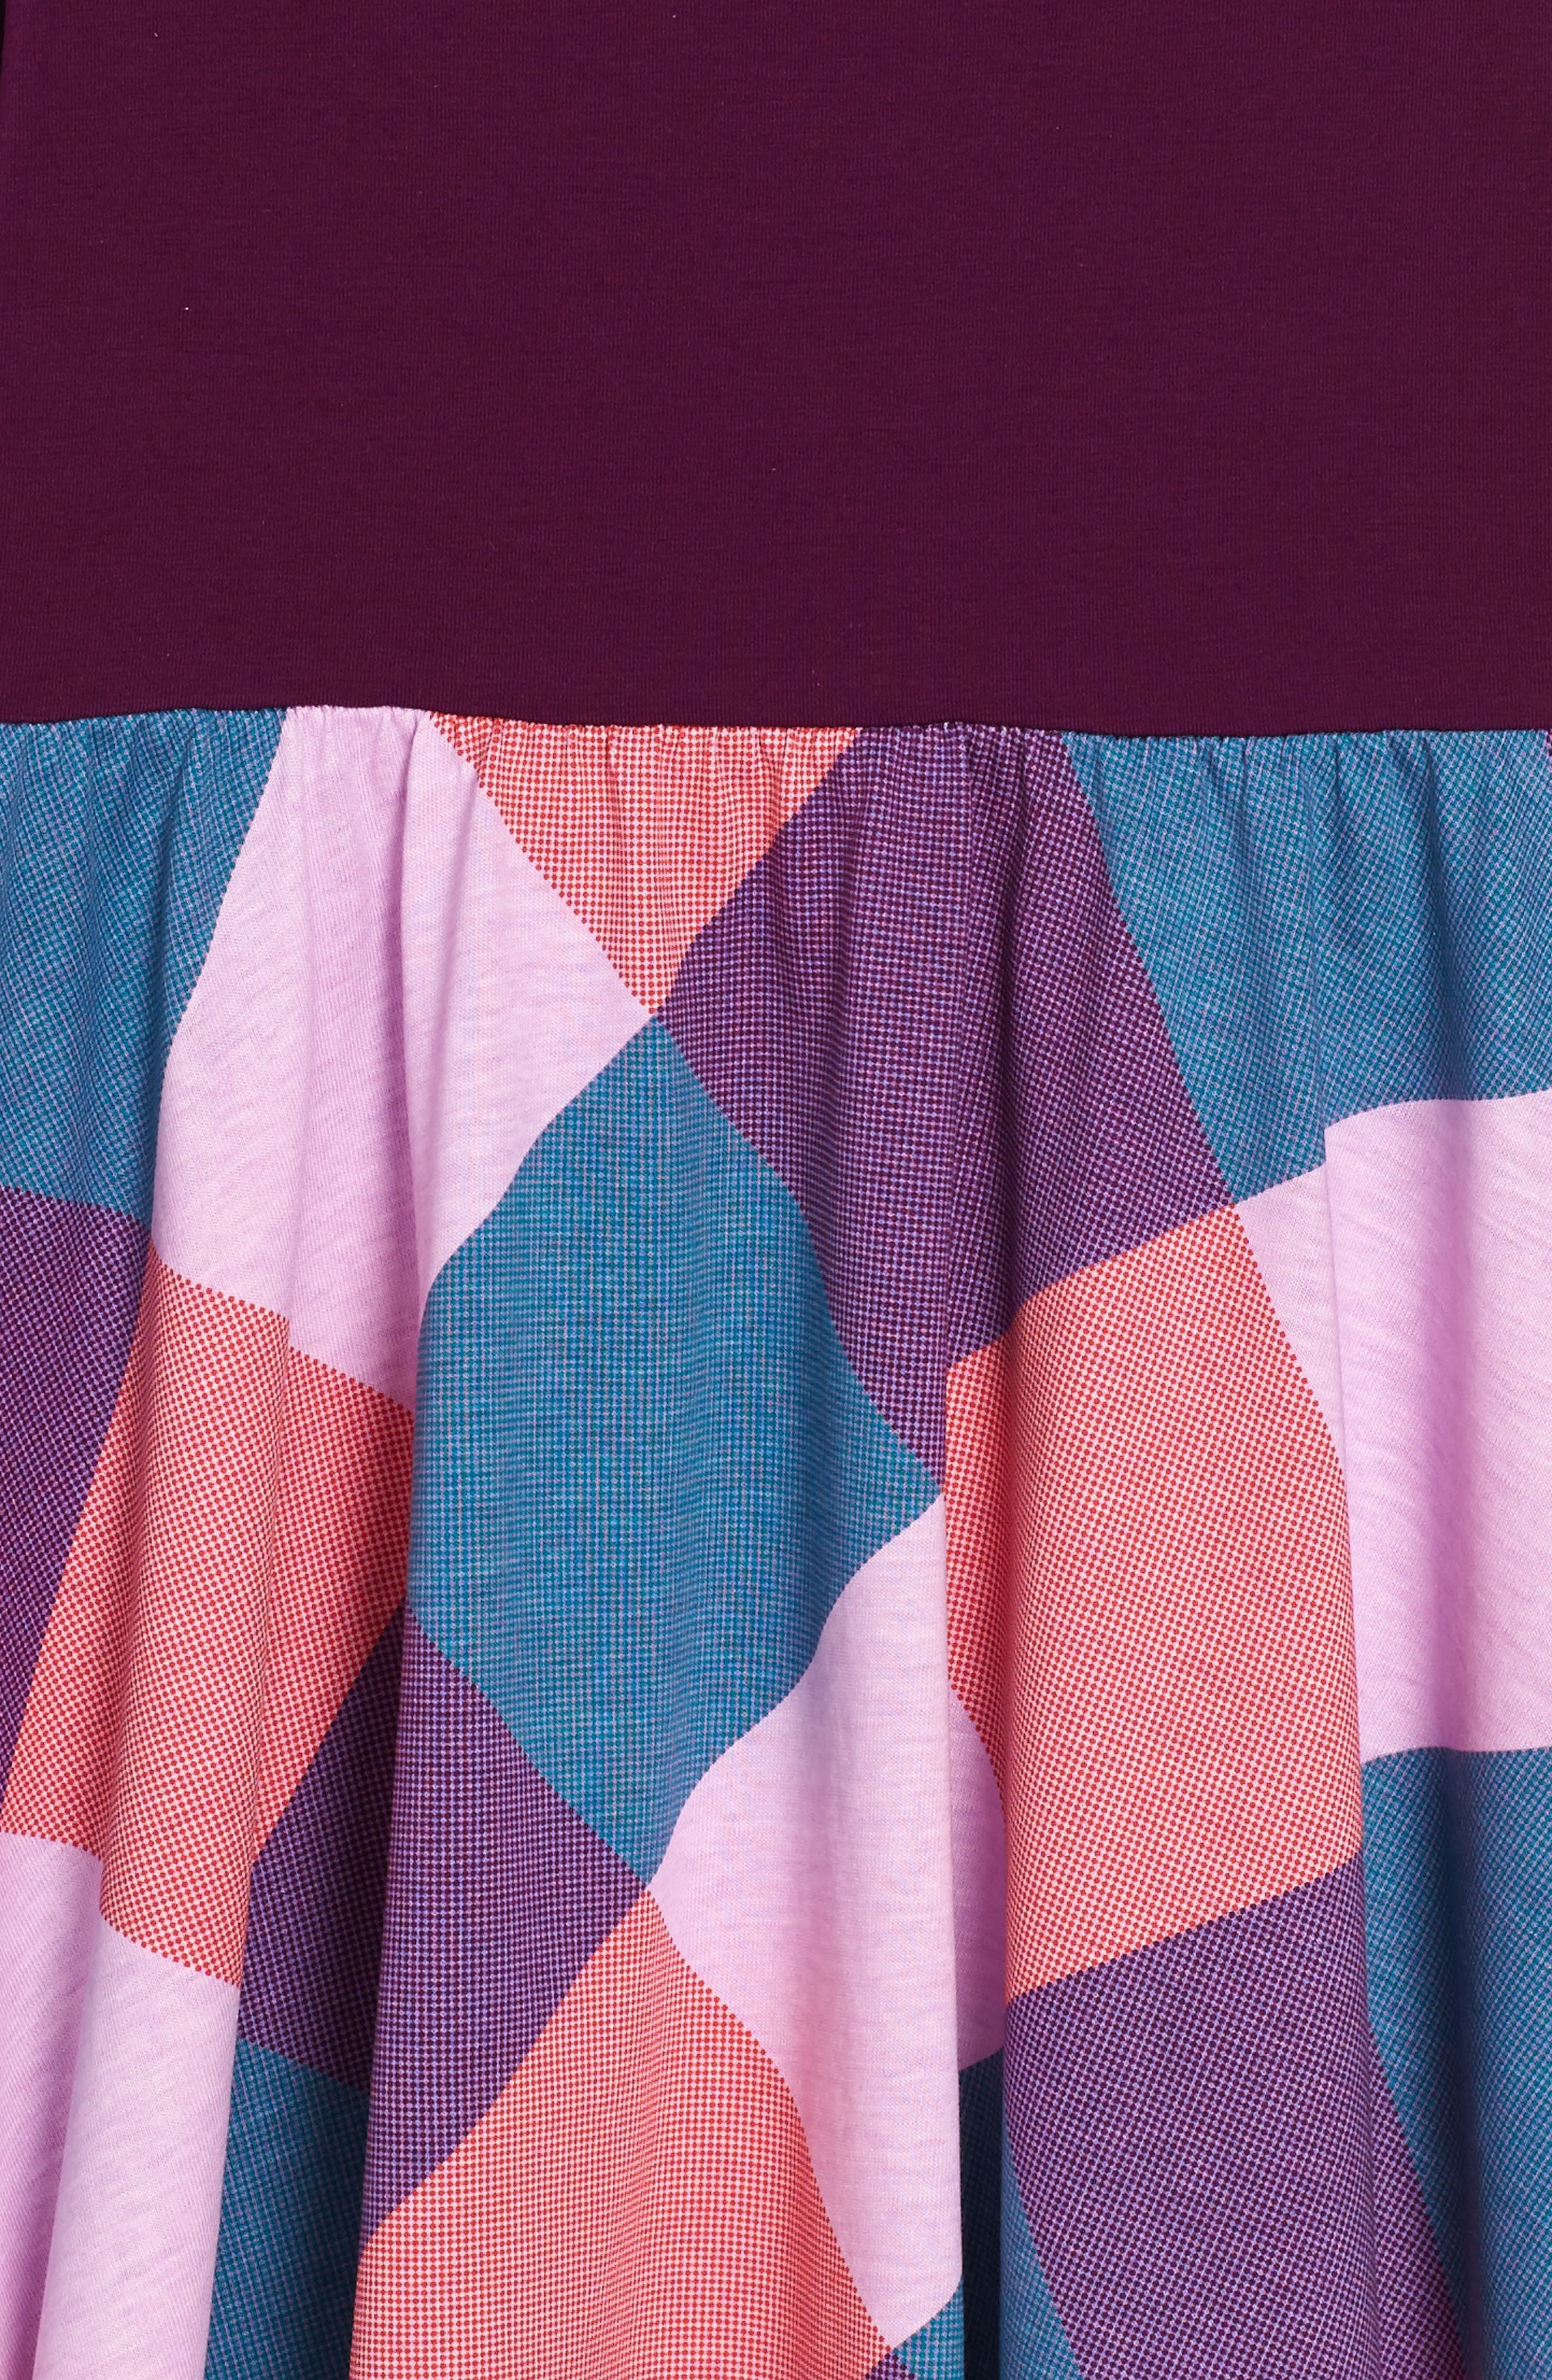 Alternate Image 3  - Tea Collection Dahlia Skirted Dress (Toddler Girls, Little Girls & Big Girls)